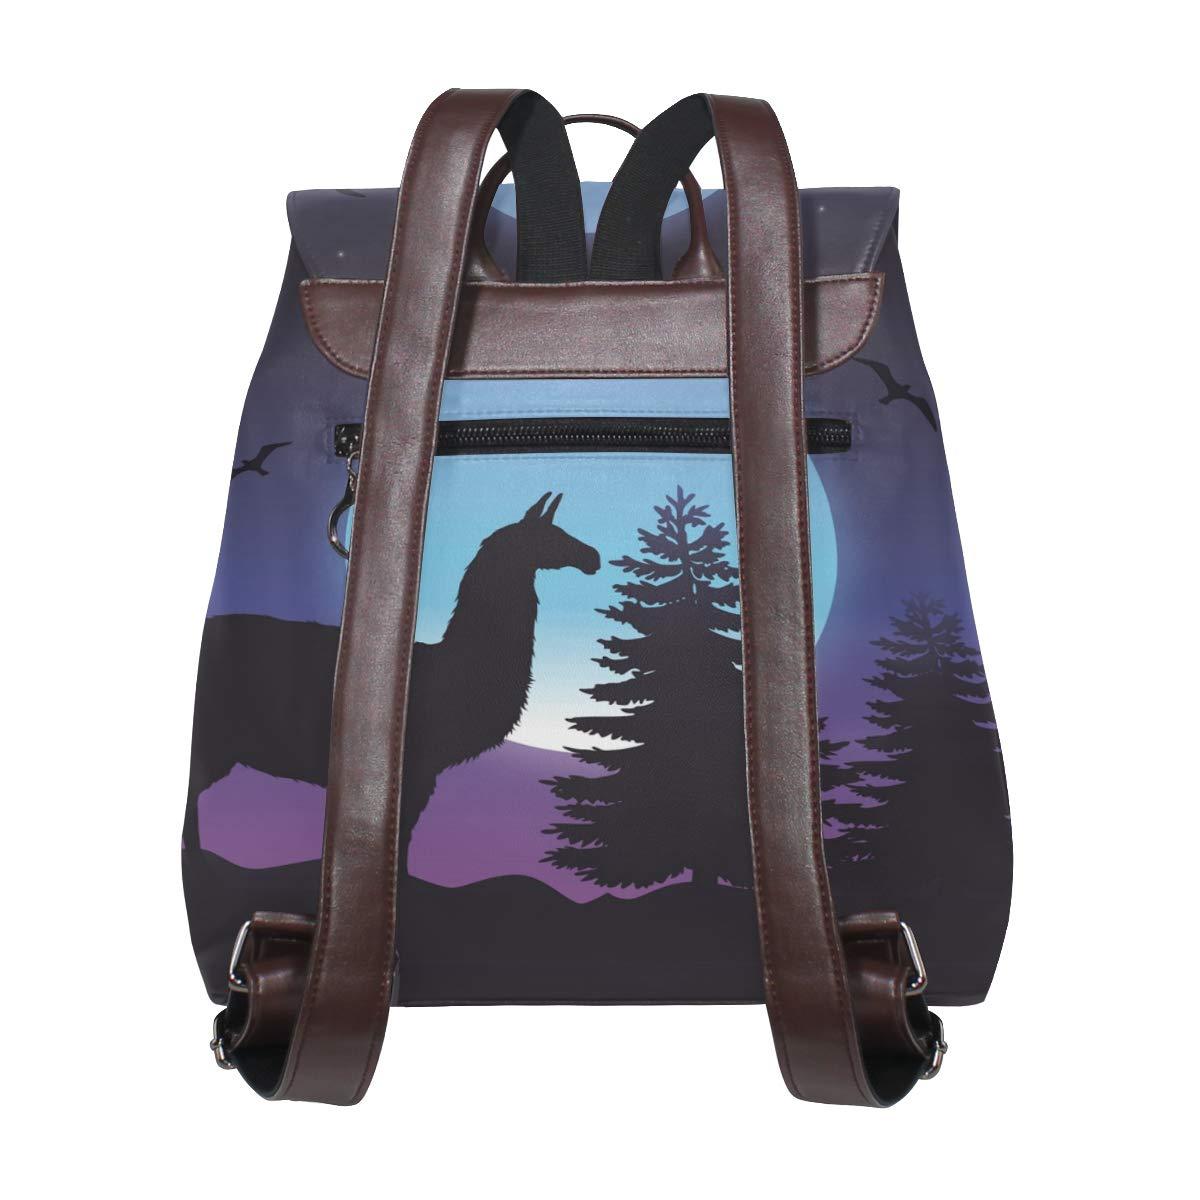 Women PU Leather Fashion Backpack Purse Grey Raccoon Travel School Shoulder Bag Girls Ladies Daypack Handbags